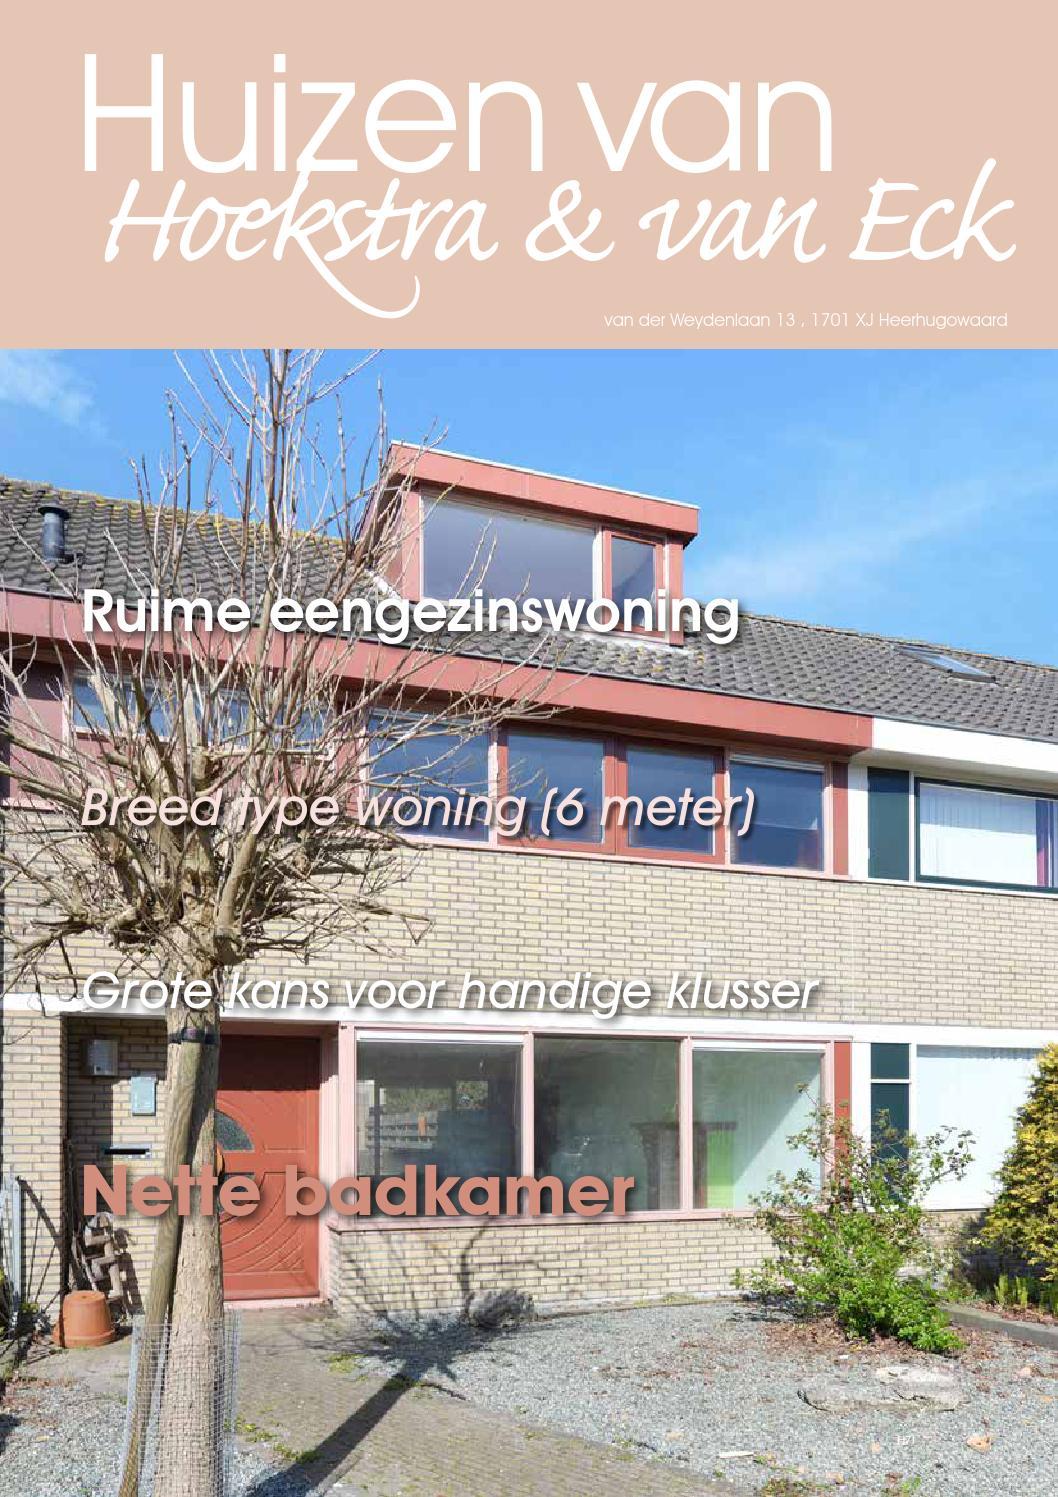 Heerhugowaard van der weydenlaan 13 by hoekstra en van for Van der meer makelaars